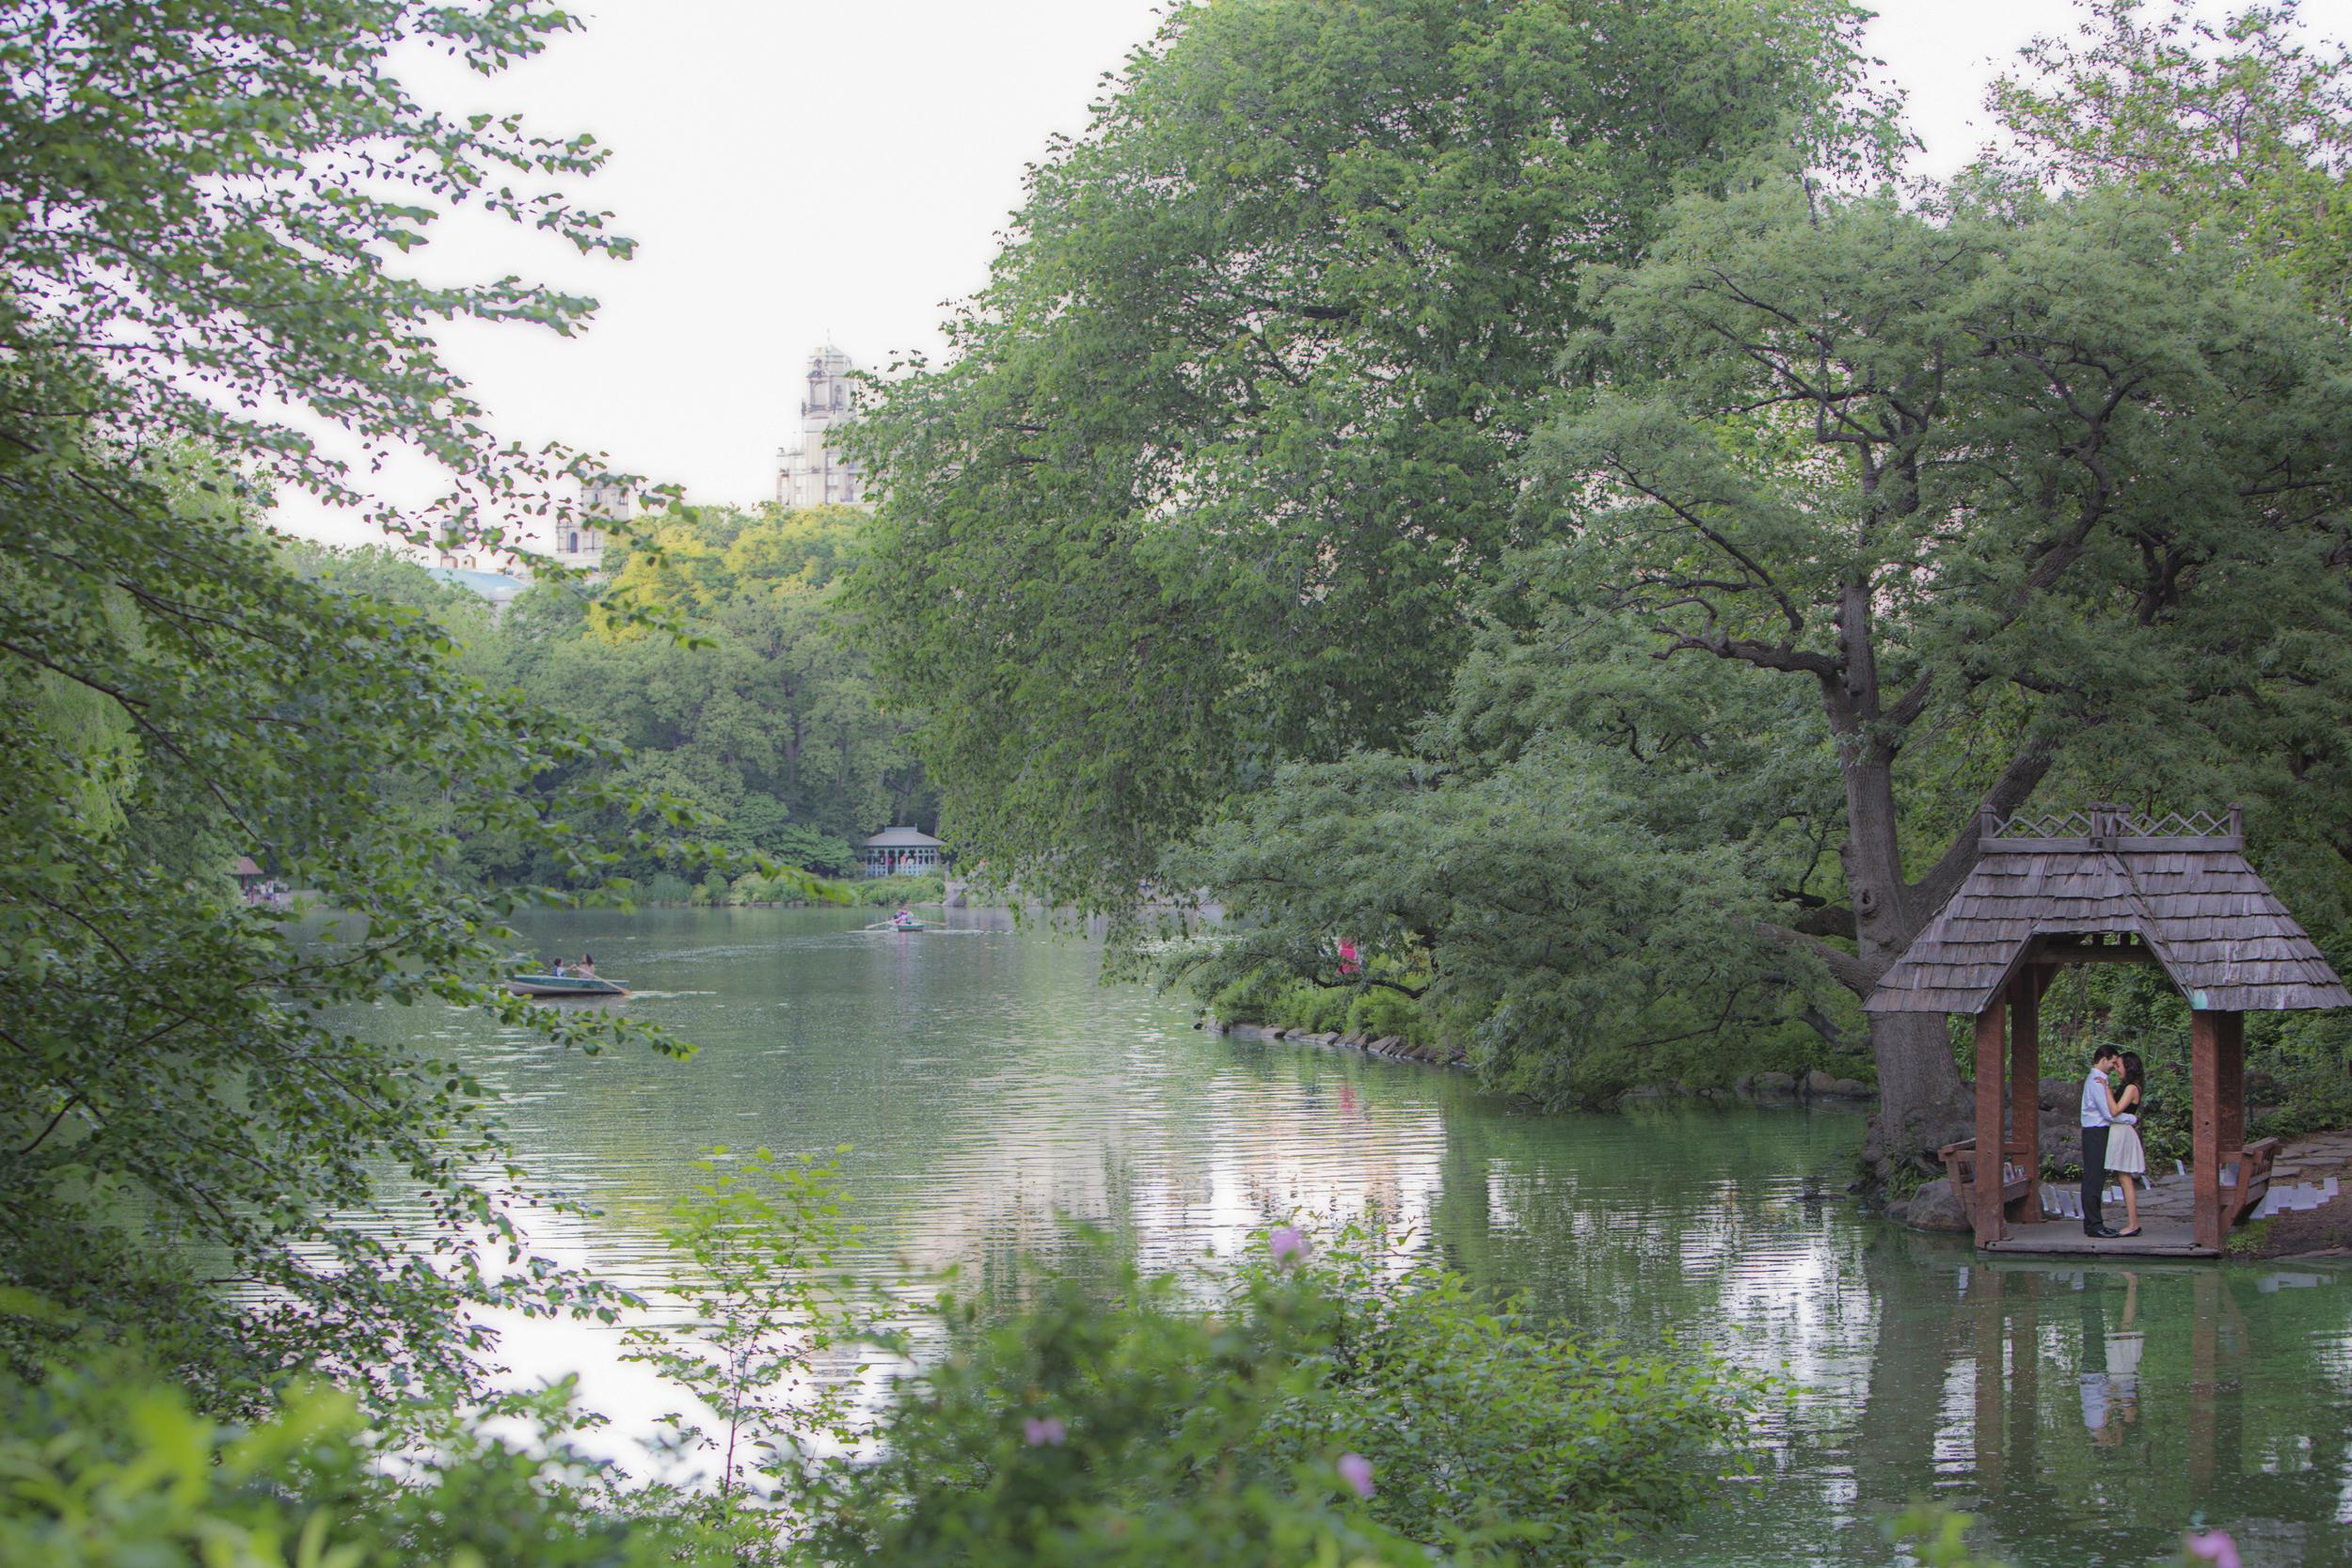 CENTRAL PARK LAKES